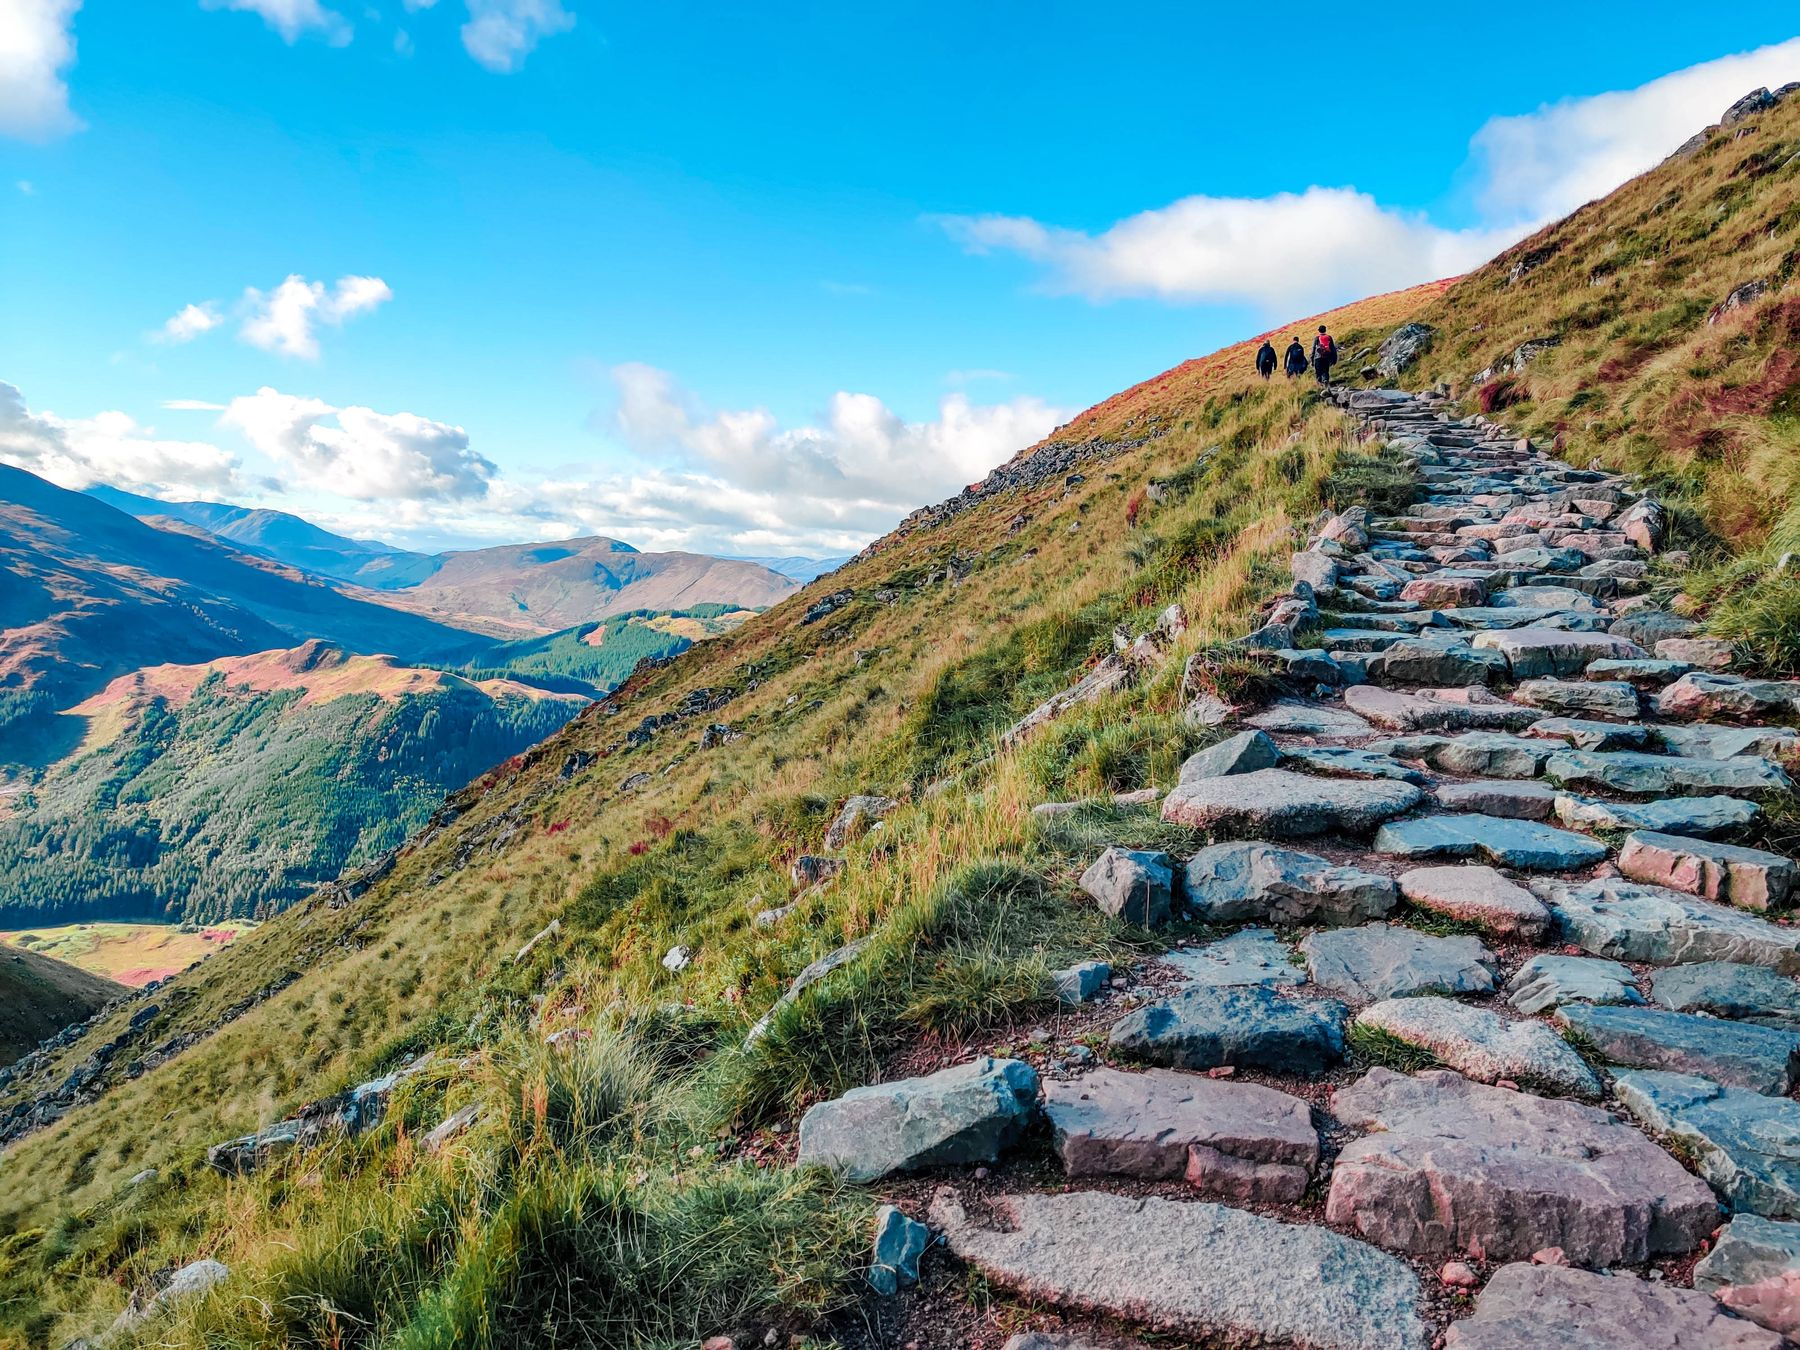 Steps along Ben Nevis hike